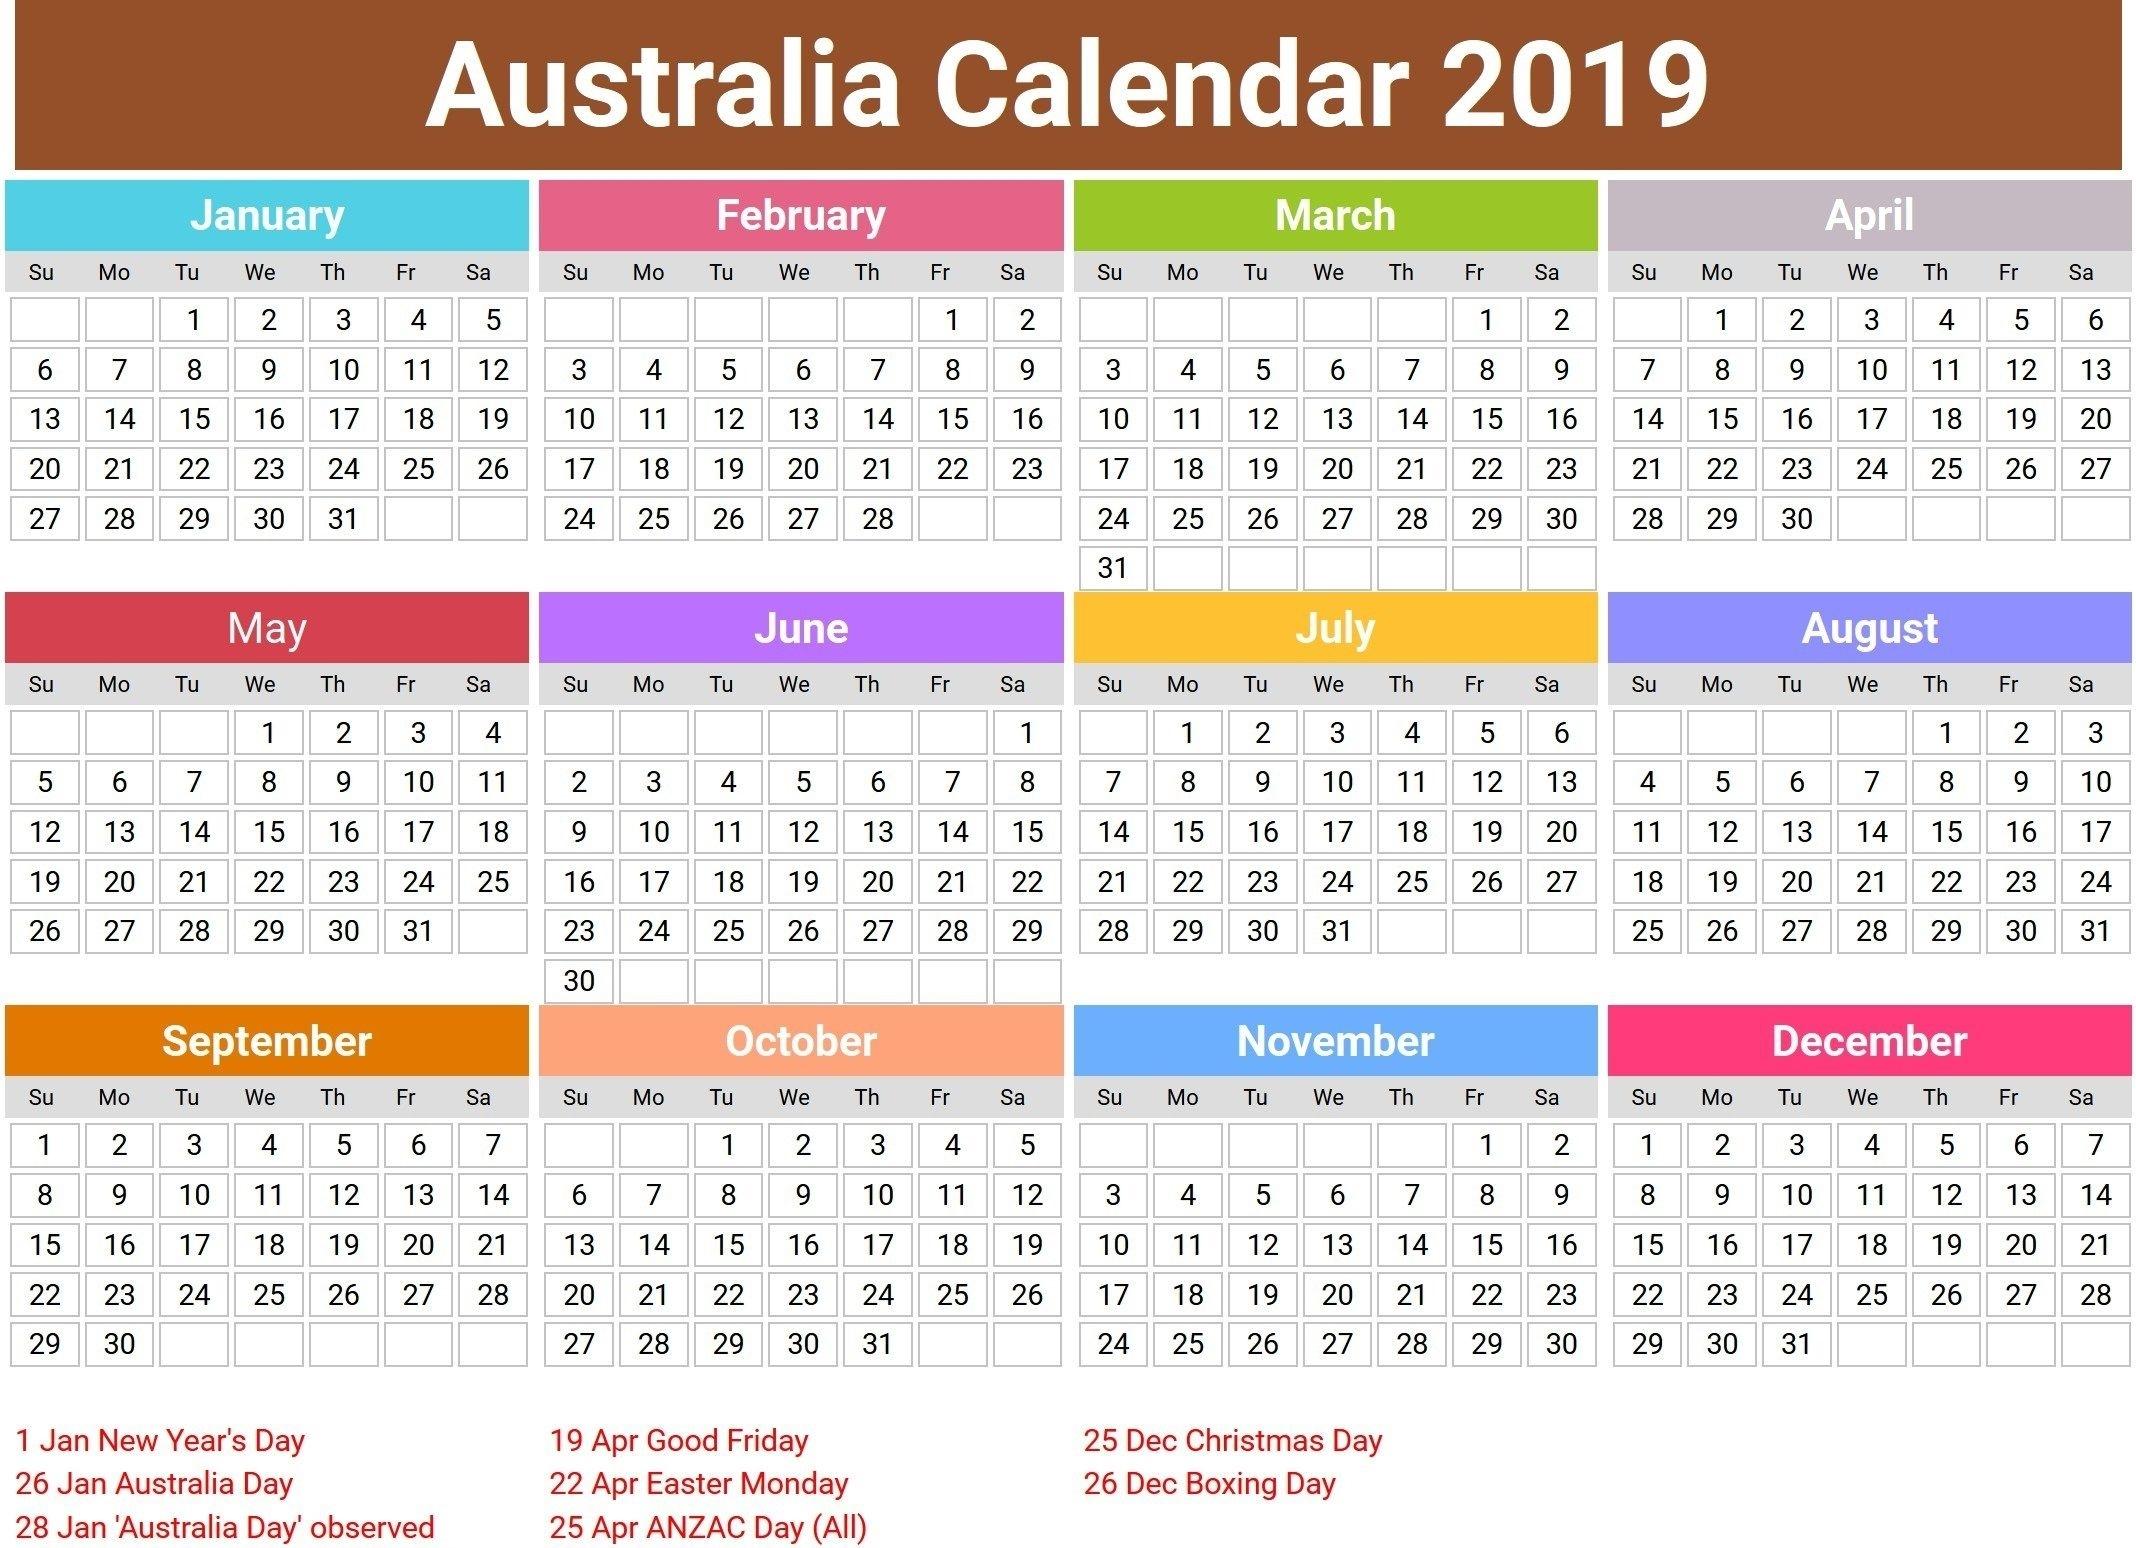 Australia 2019 Calendar With Holidays   Printable Calendar